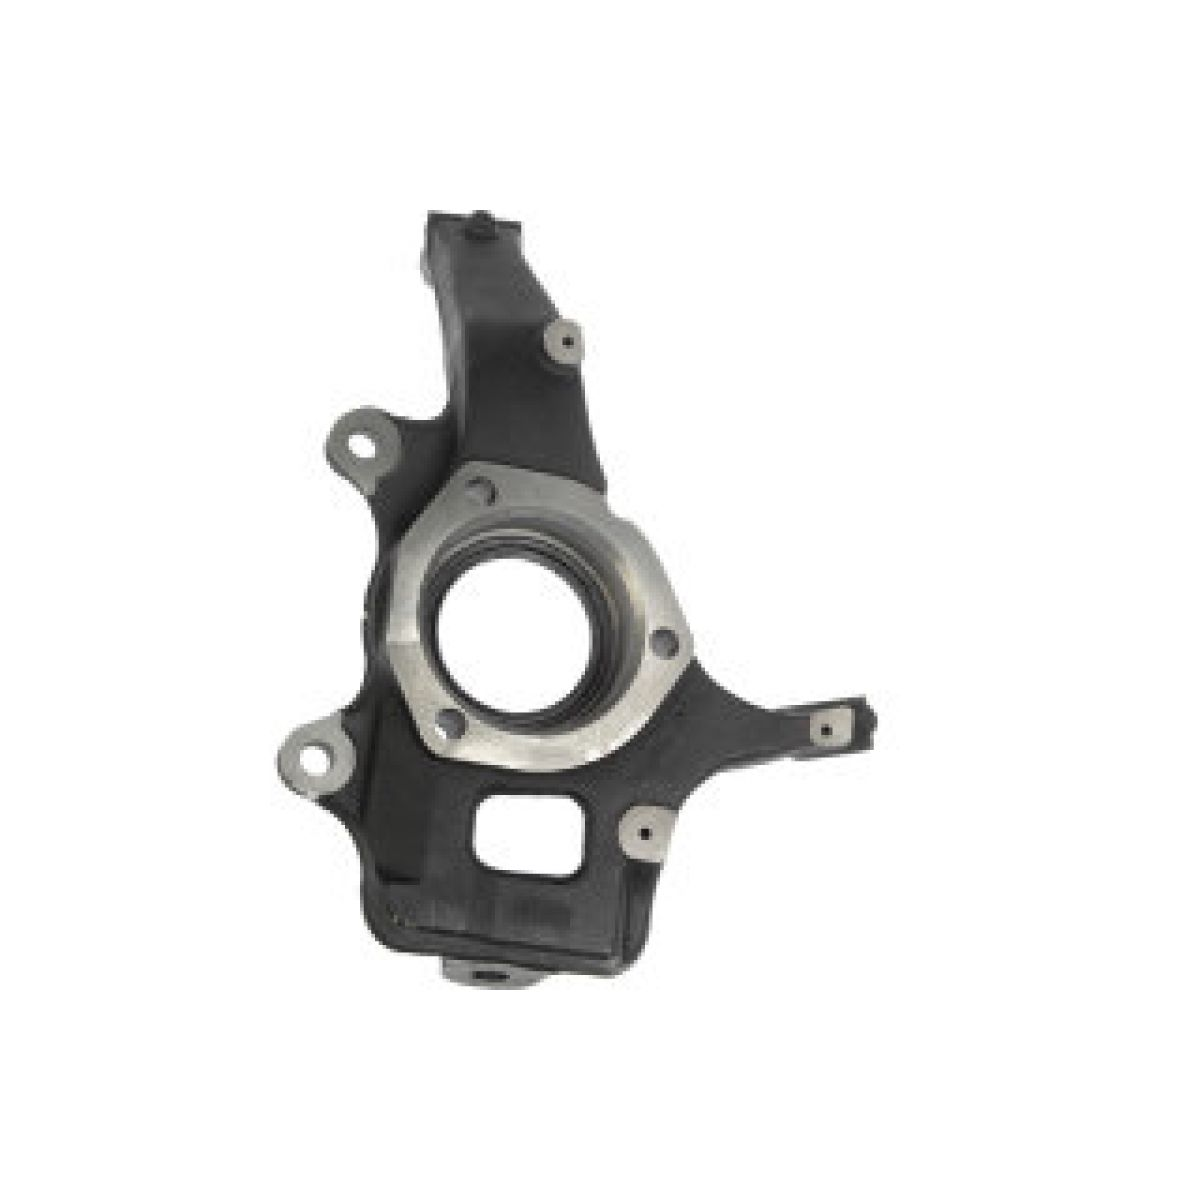 Dorman 697-900 Steering Knuckle RH